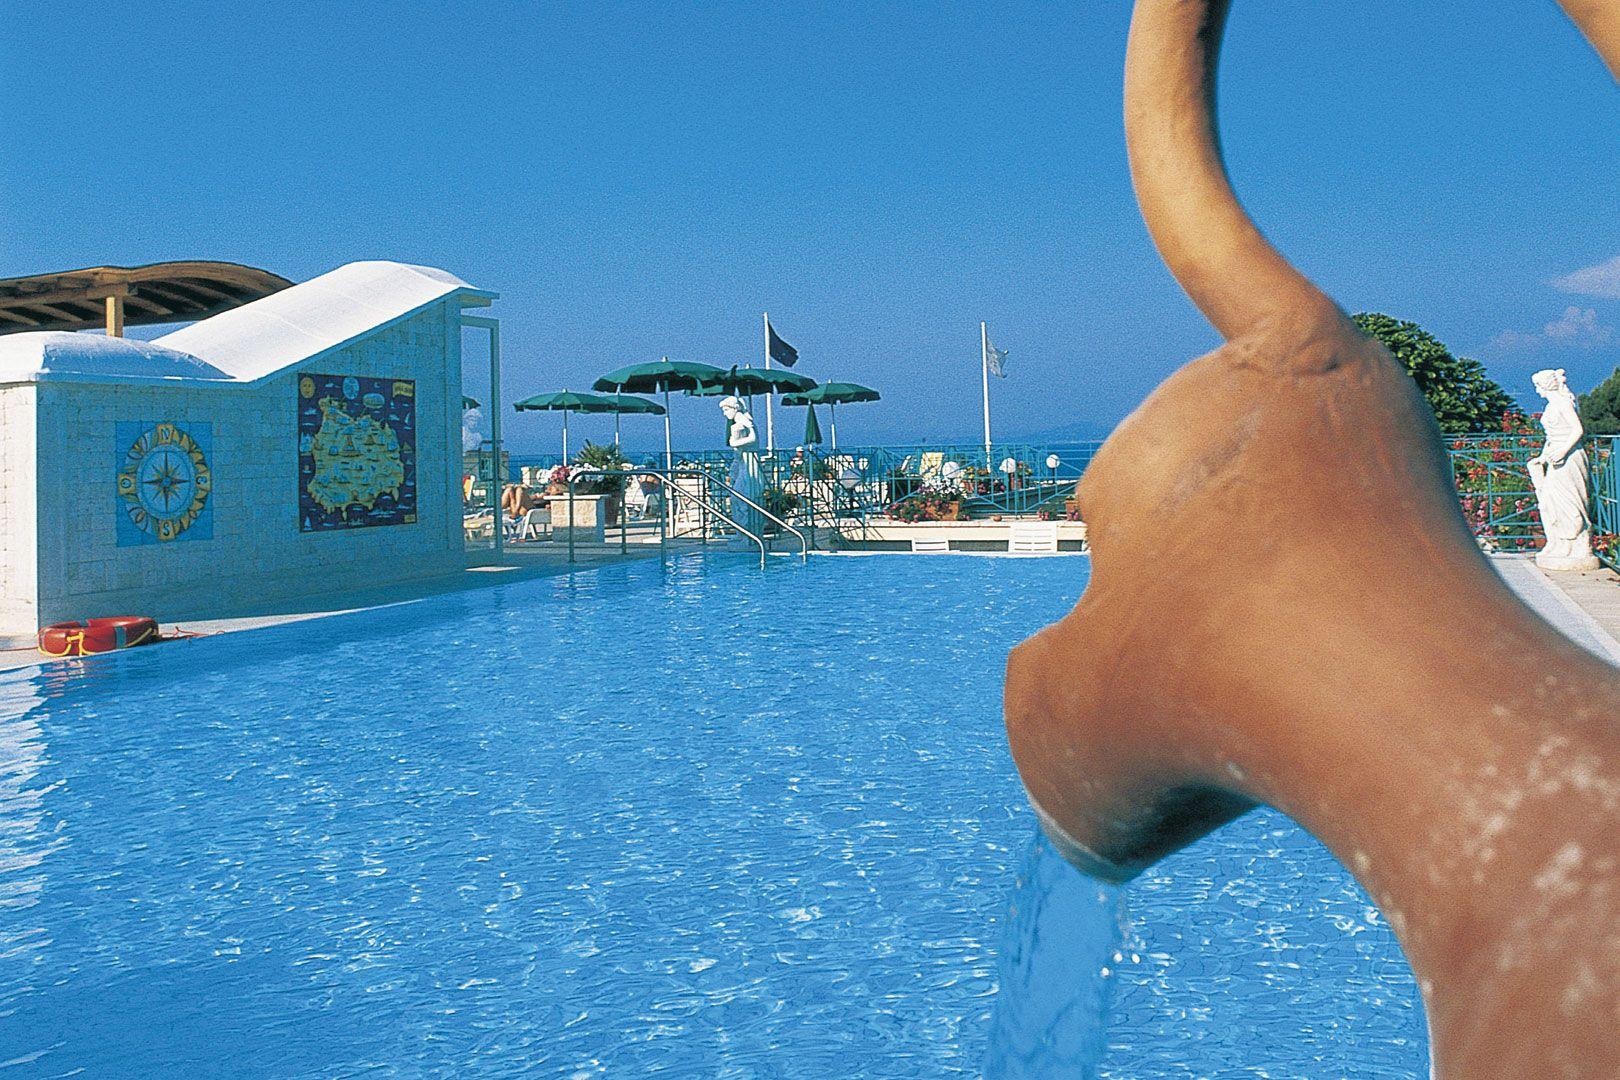 Hotel-Ischia-Grand-Hotel-Terme-di-Augusto-terme-piscina-esterna-1